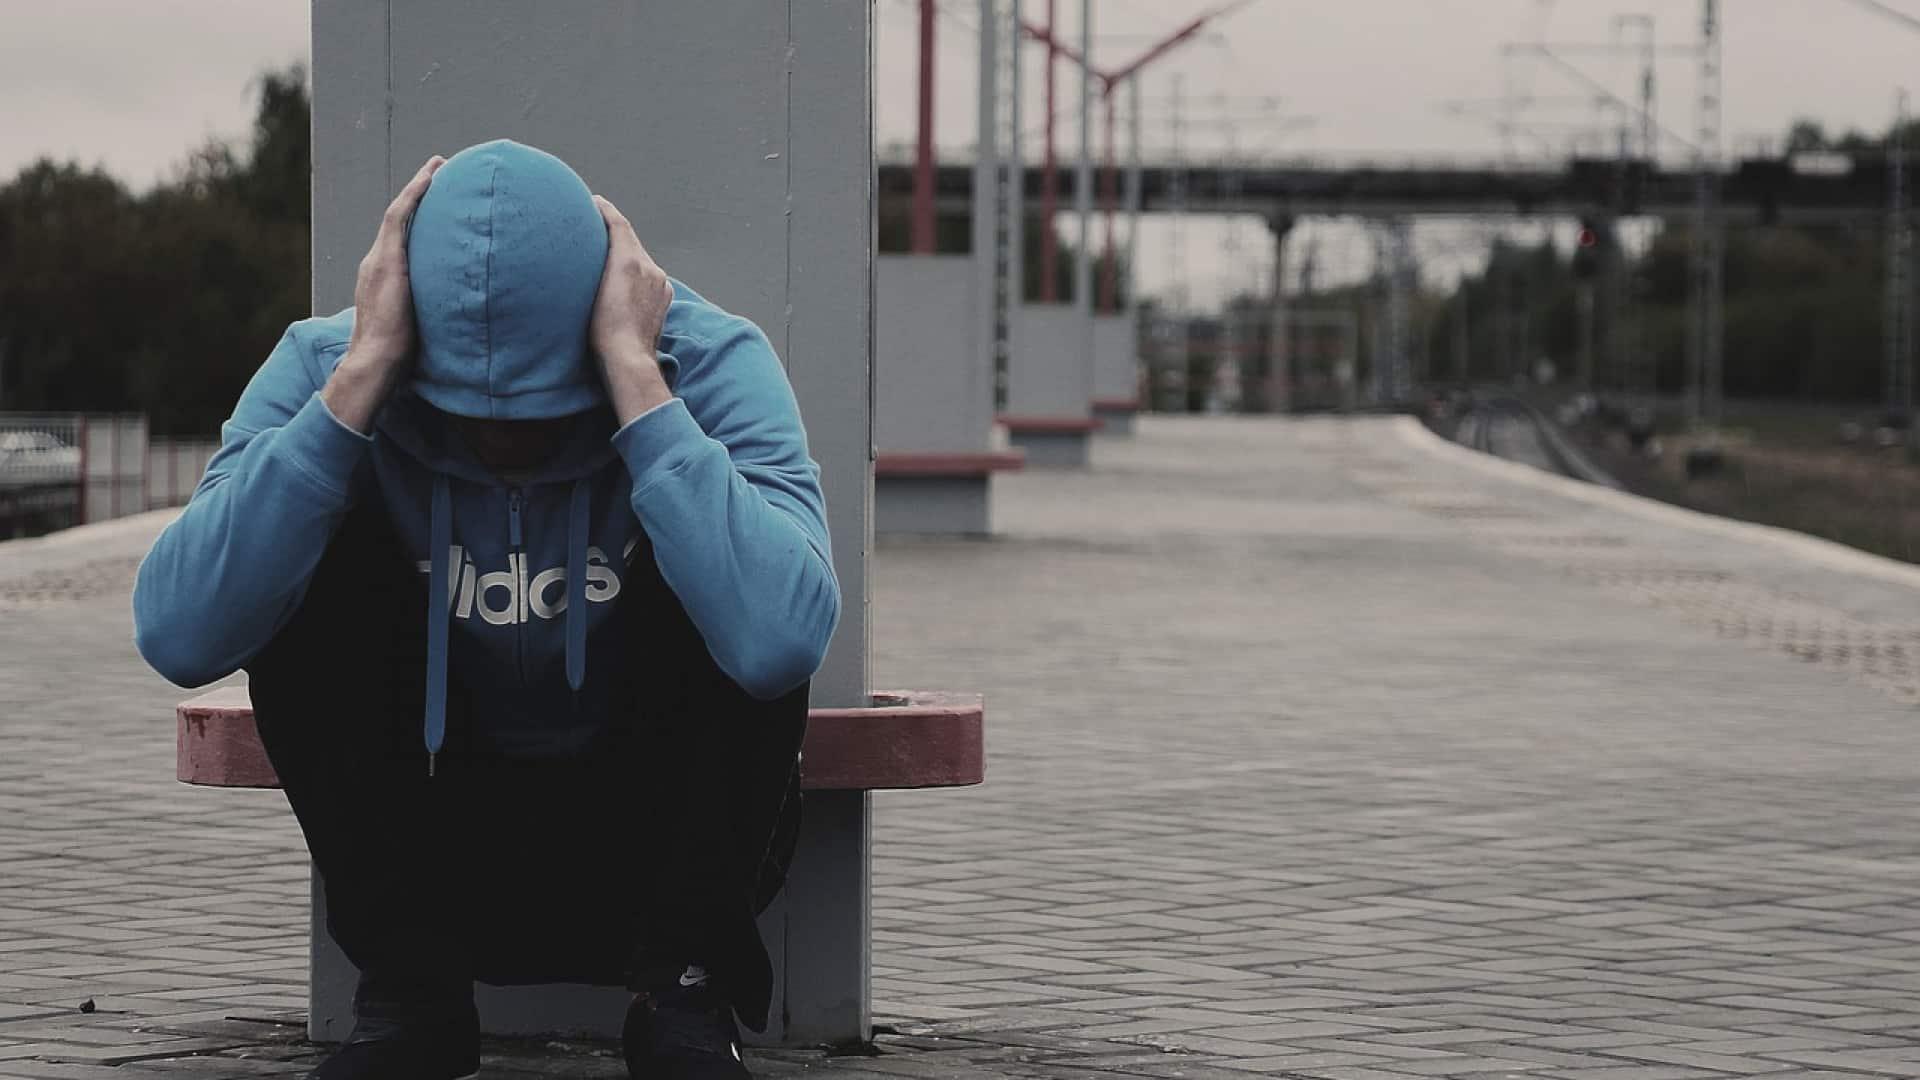 Pourquoi consulter un addictologue ?